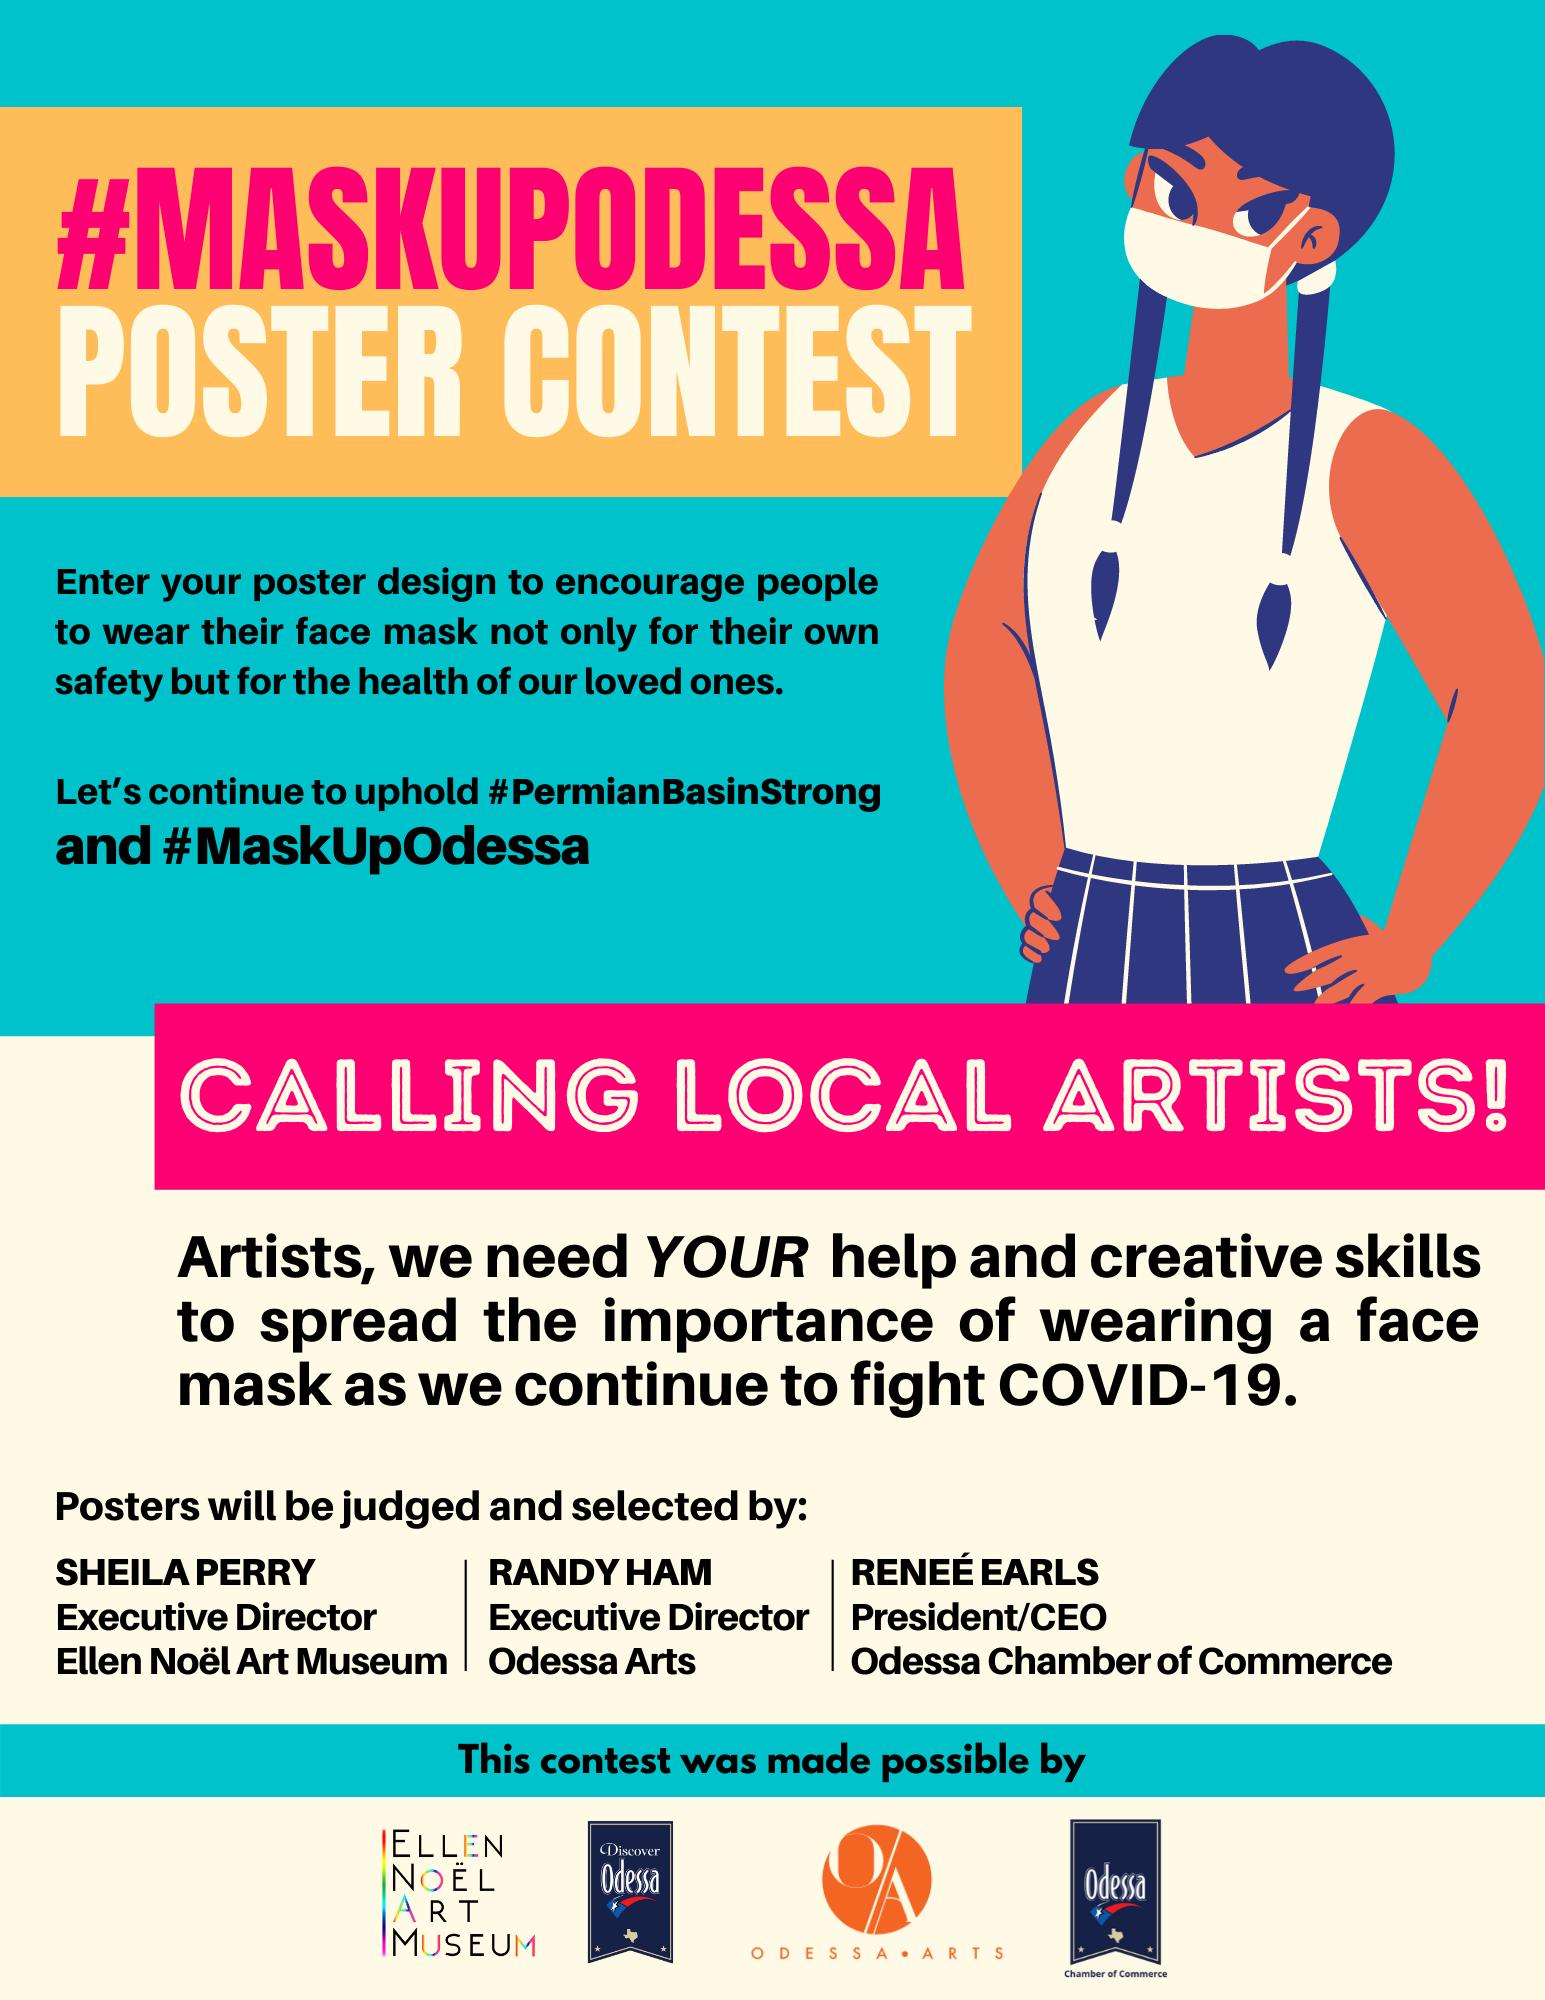 Noel Org MaskUpOdessa   Poster Contest — ellen noel art museum